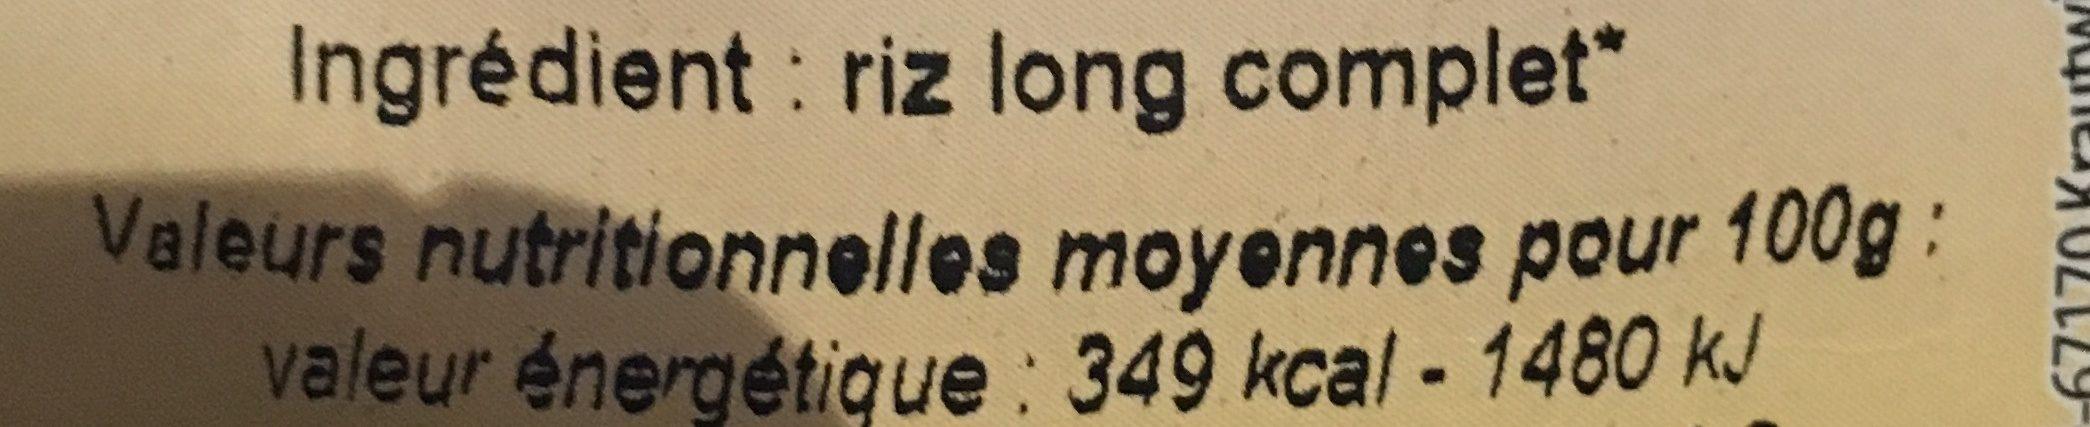 Riz long complet - Ingredients - fr